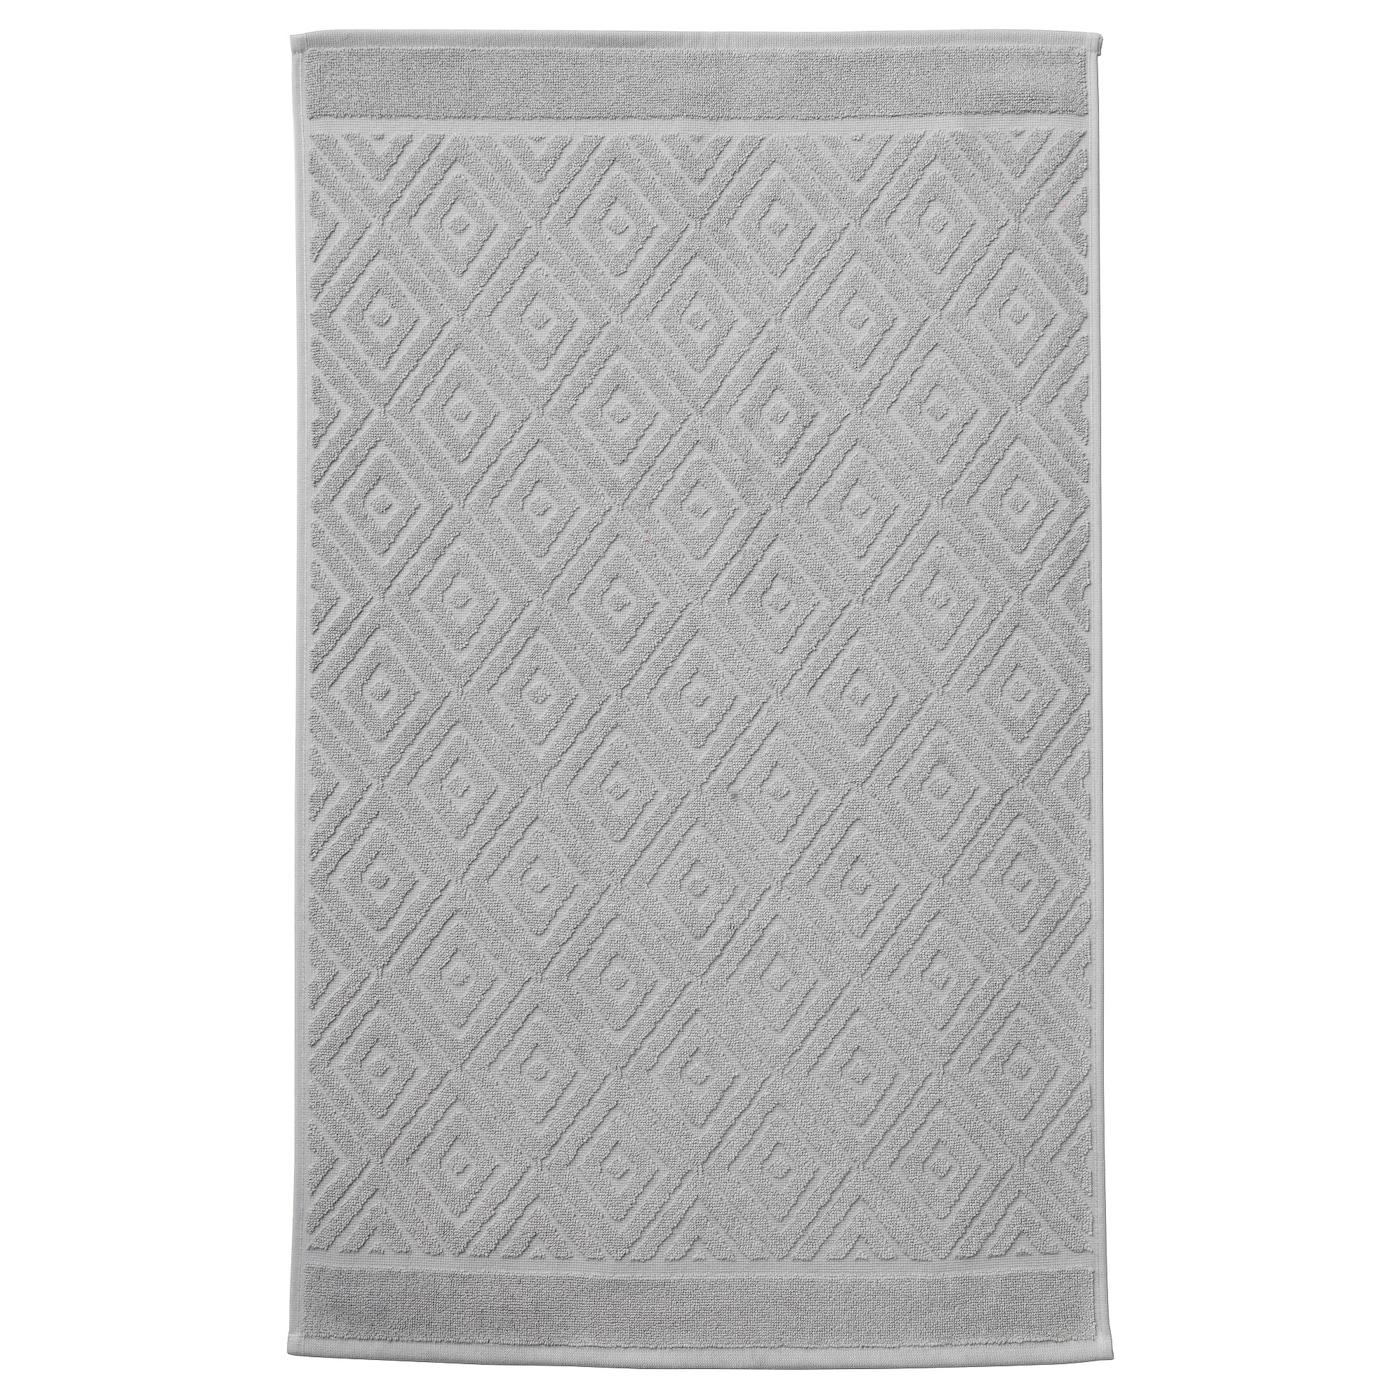 Ikea bathroom towels - Ikea F Laren Bath Mat Soft Terry Bath Mat With High Absorption Capacity Weight 800 G